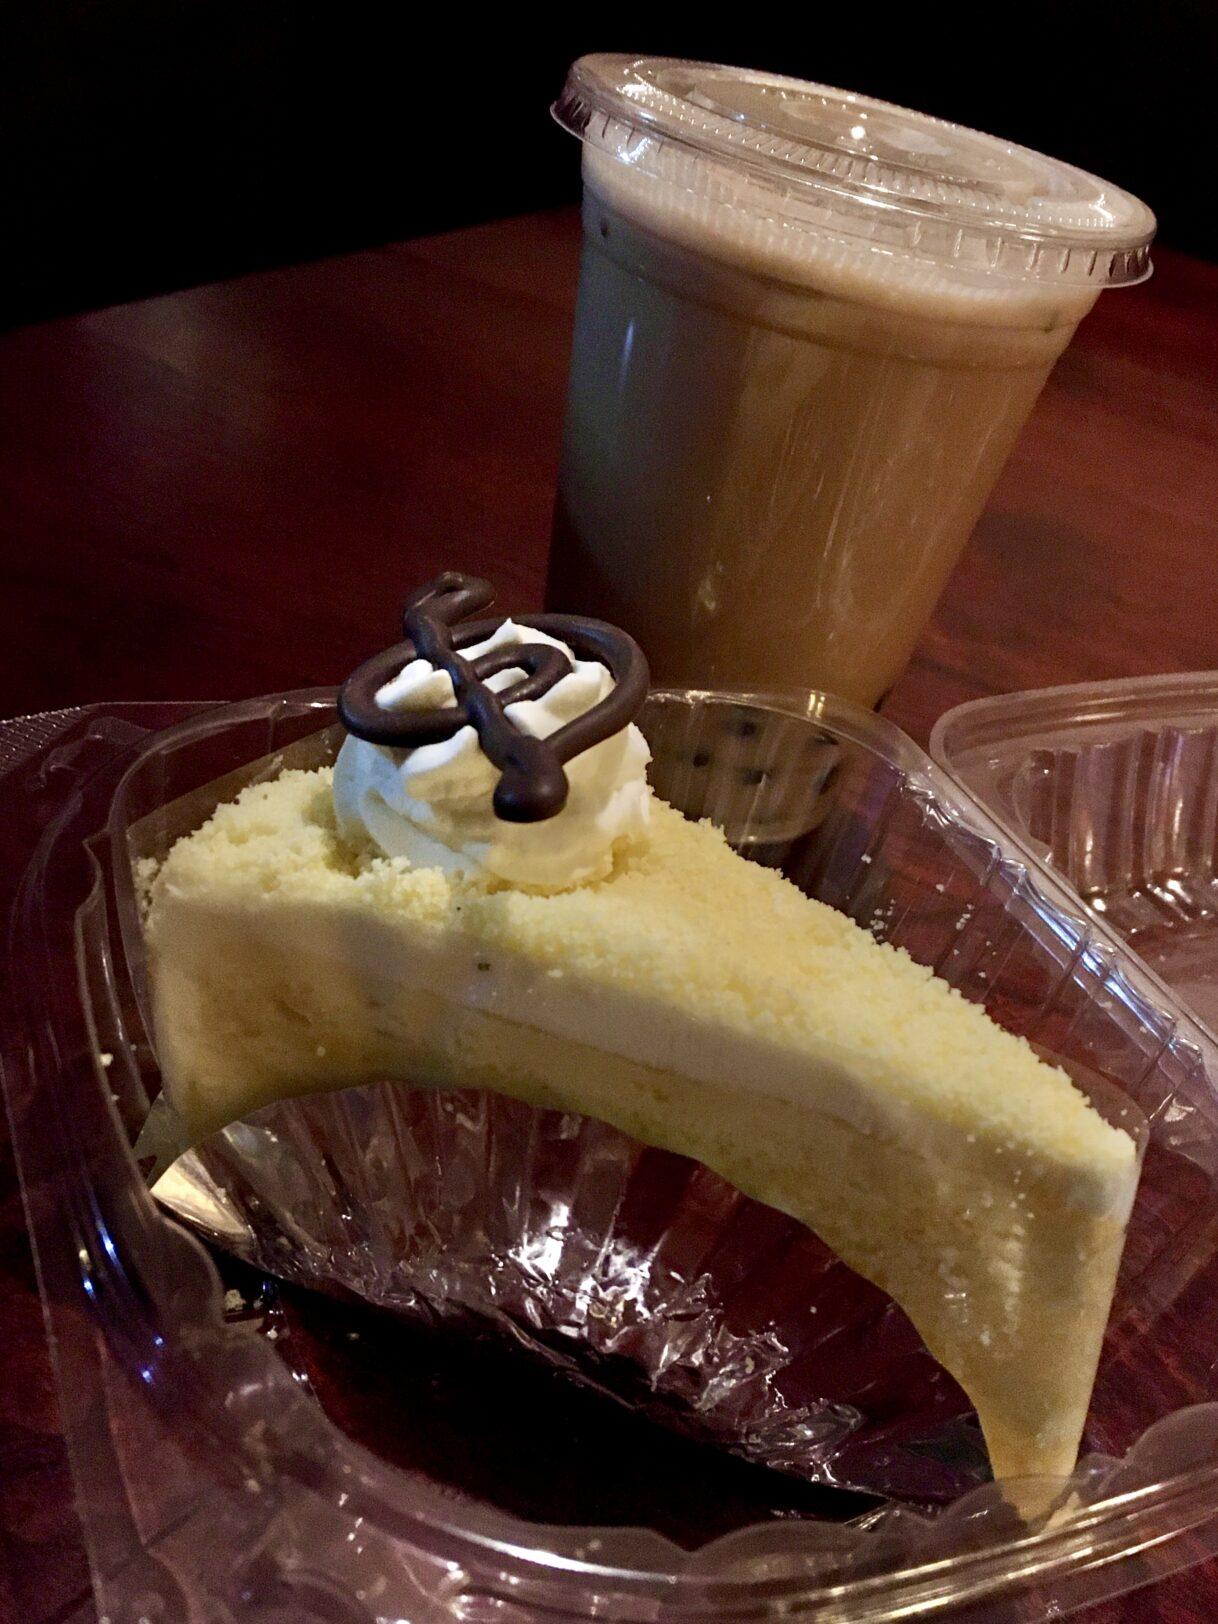 Rose Milk Tea and a Slice of Sweet Potato Cake from Cafe Mozart Bakery – Suwanee, Georgia 12/03/02020